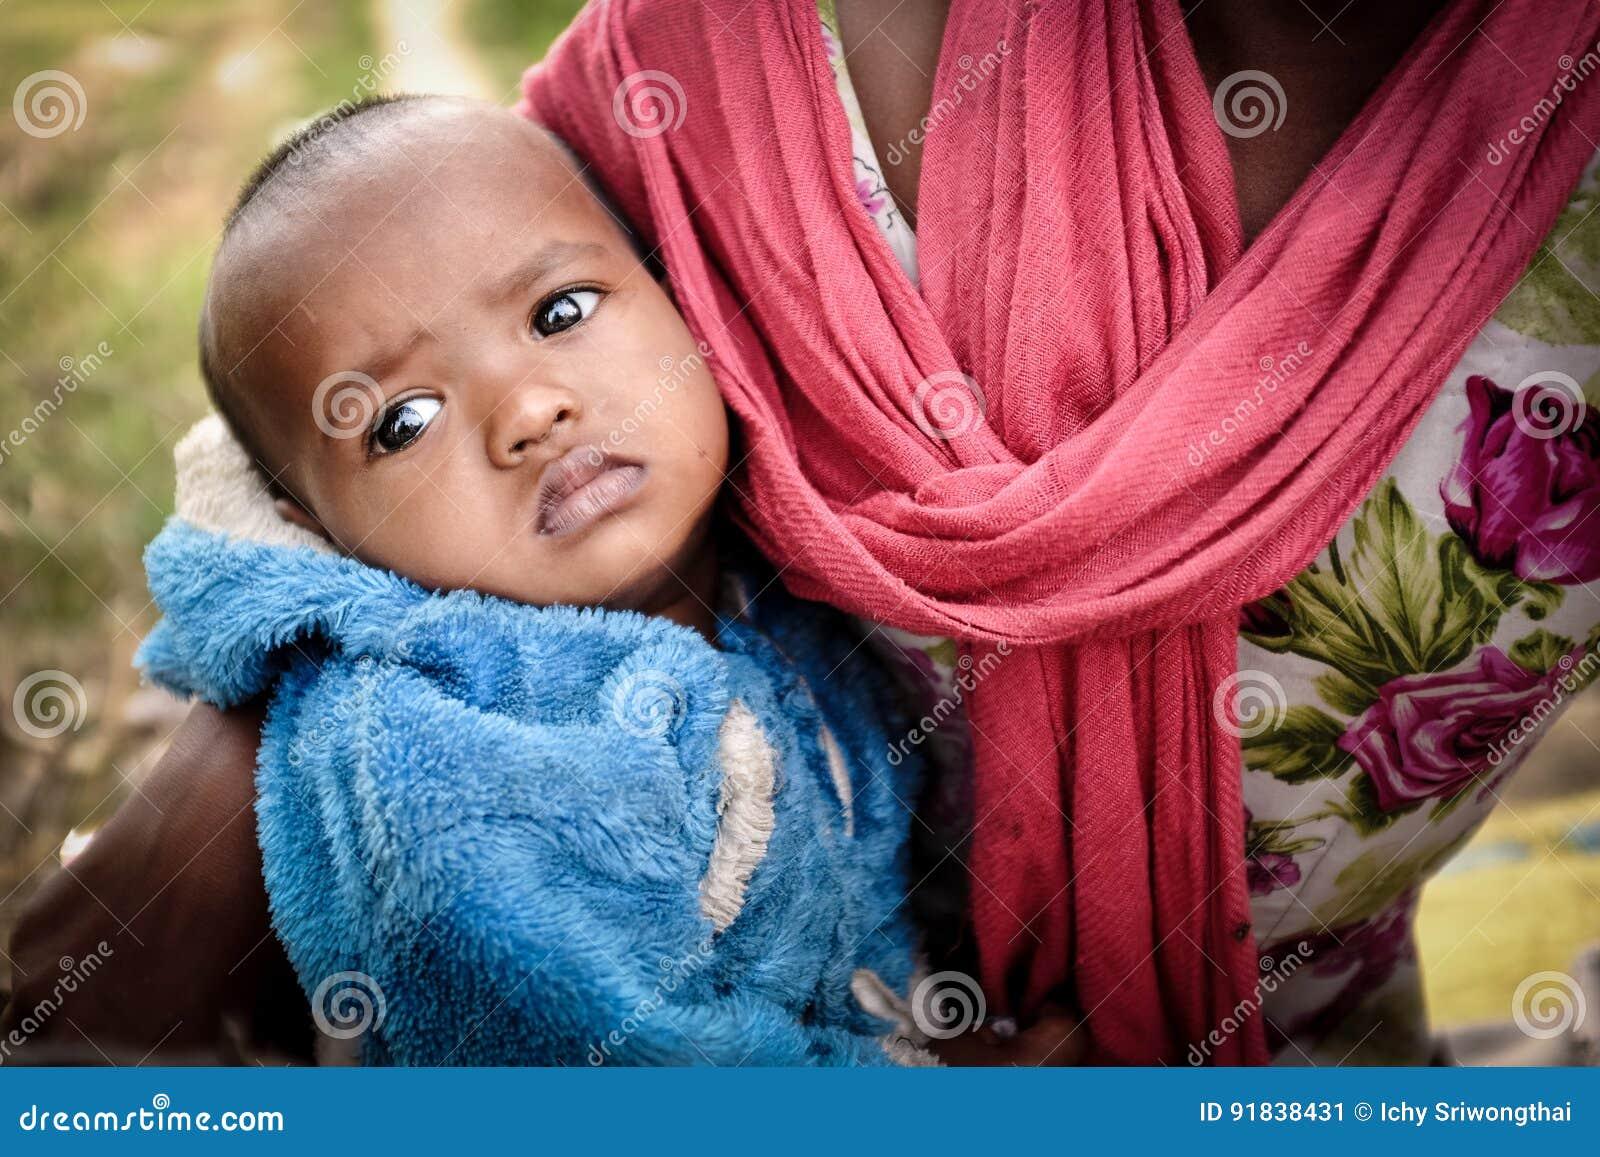 Gaya India December 3 2016 An Indian Mom Brings Her Young Baby